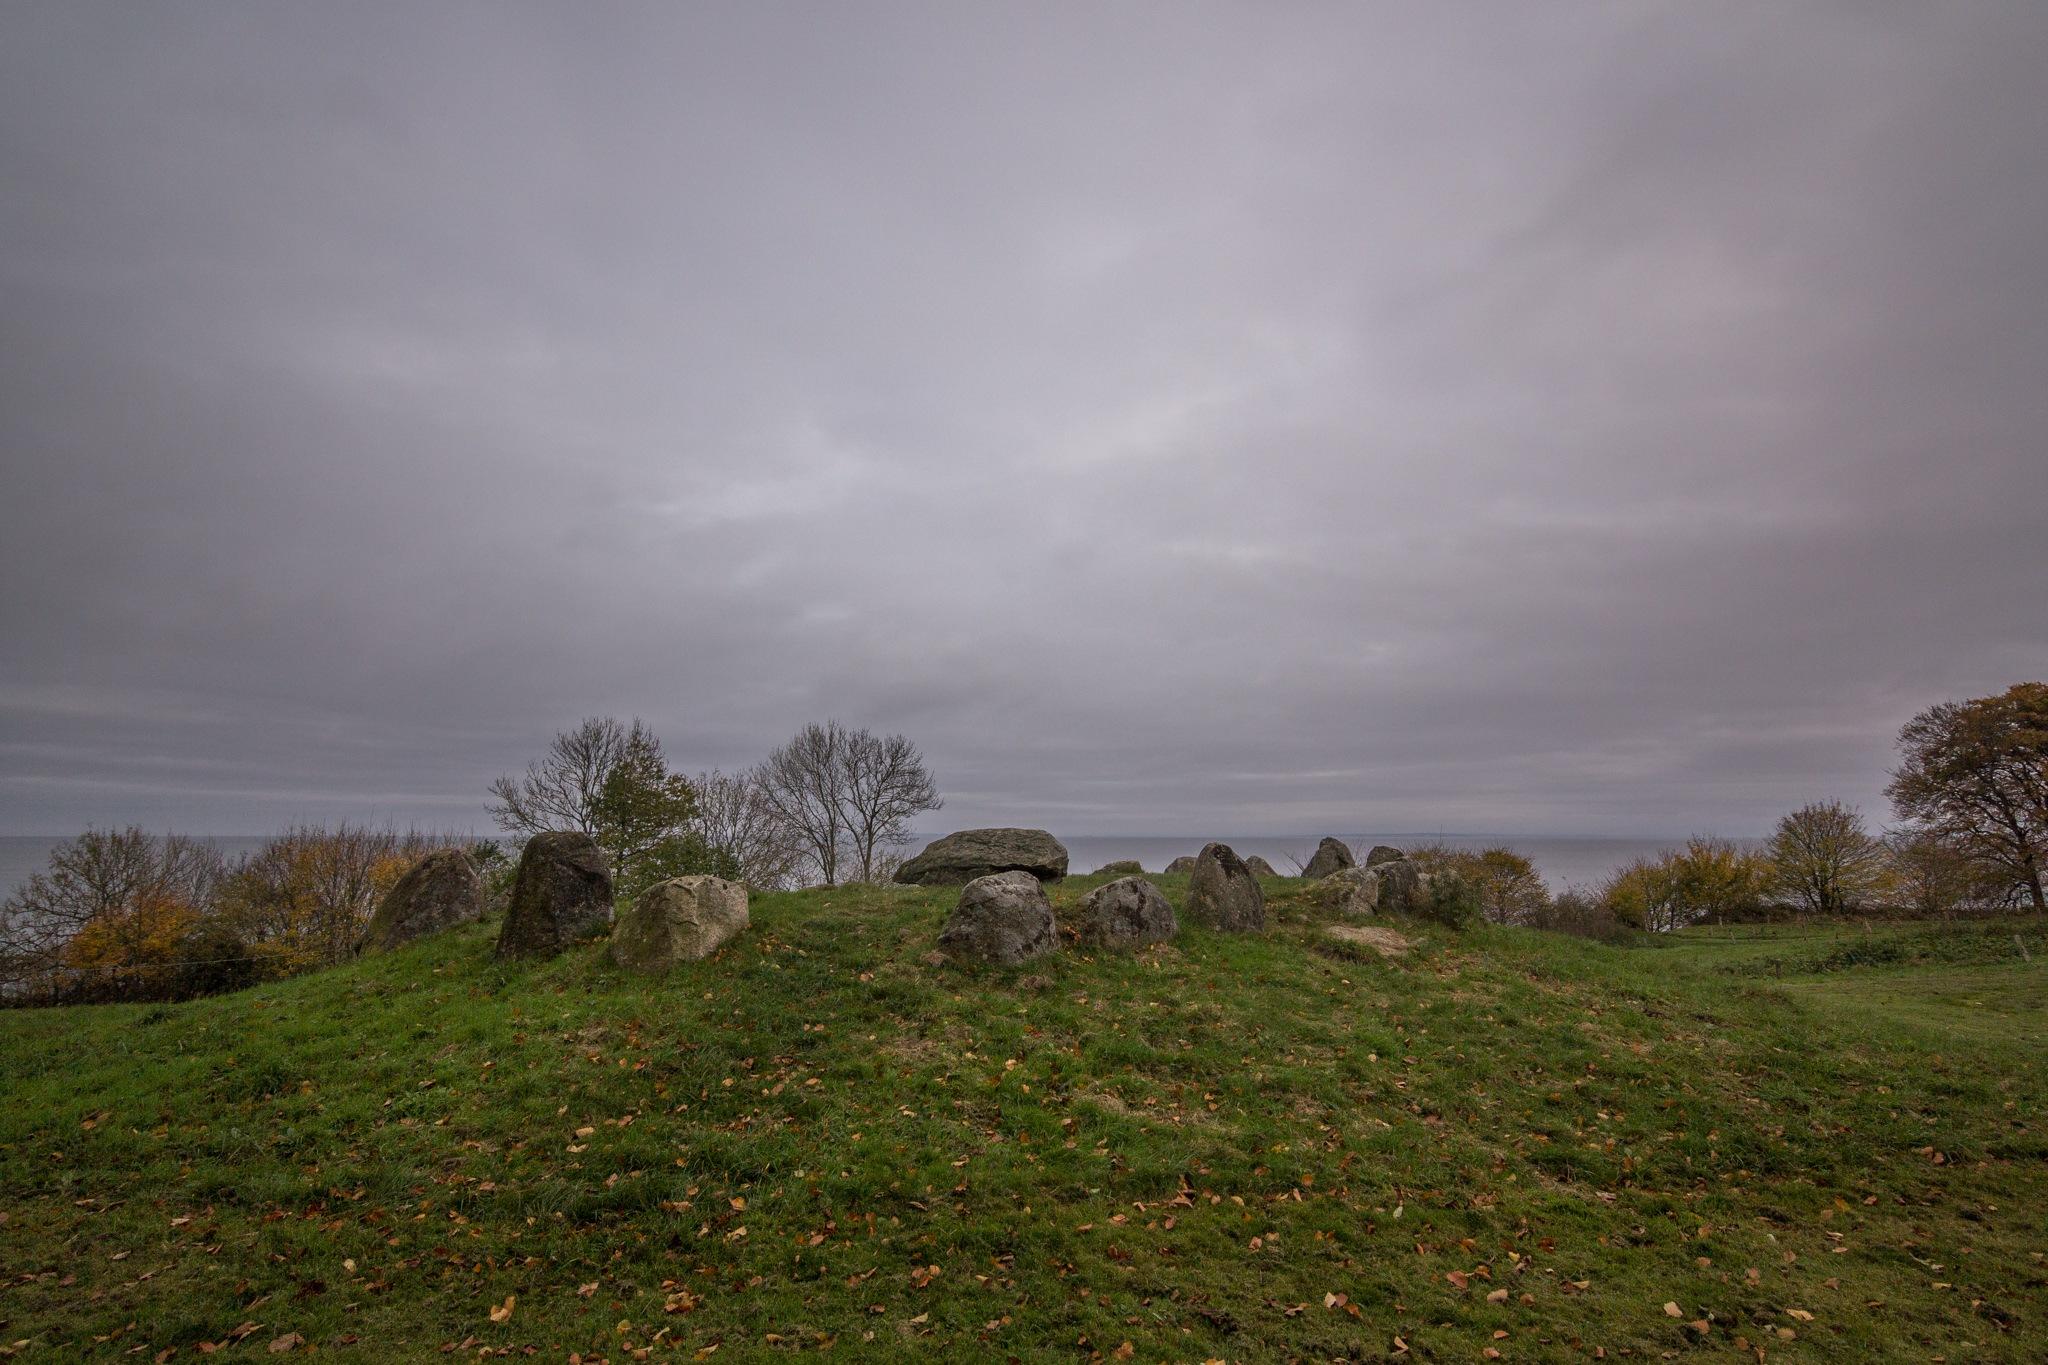 Round dolmen 3000 BC  by Kjeld Jensen